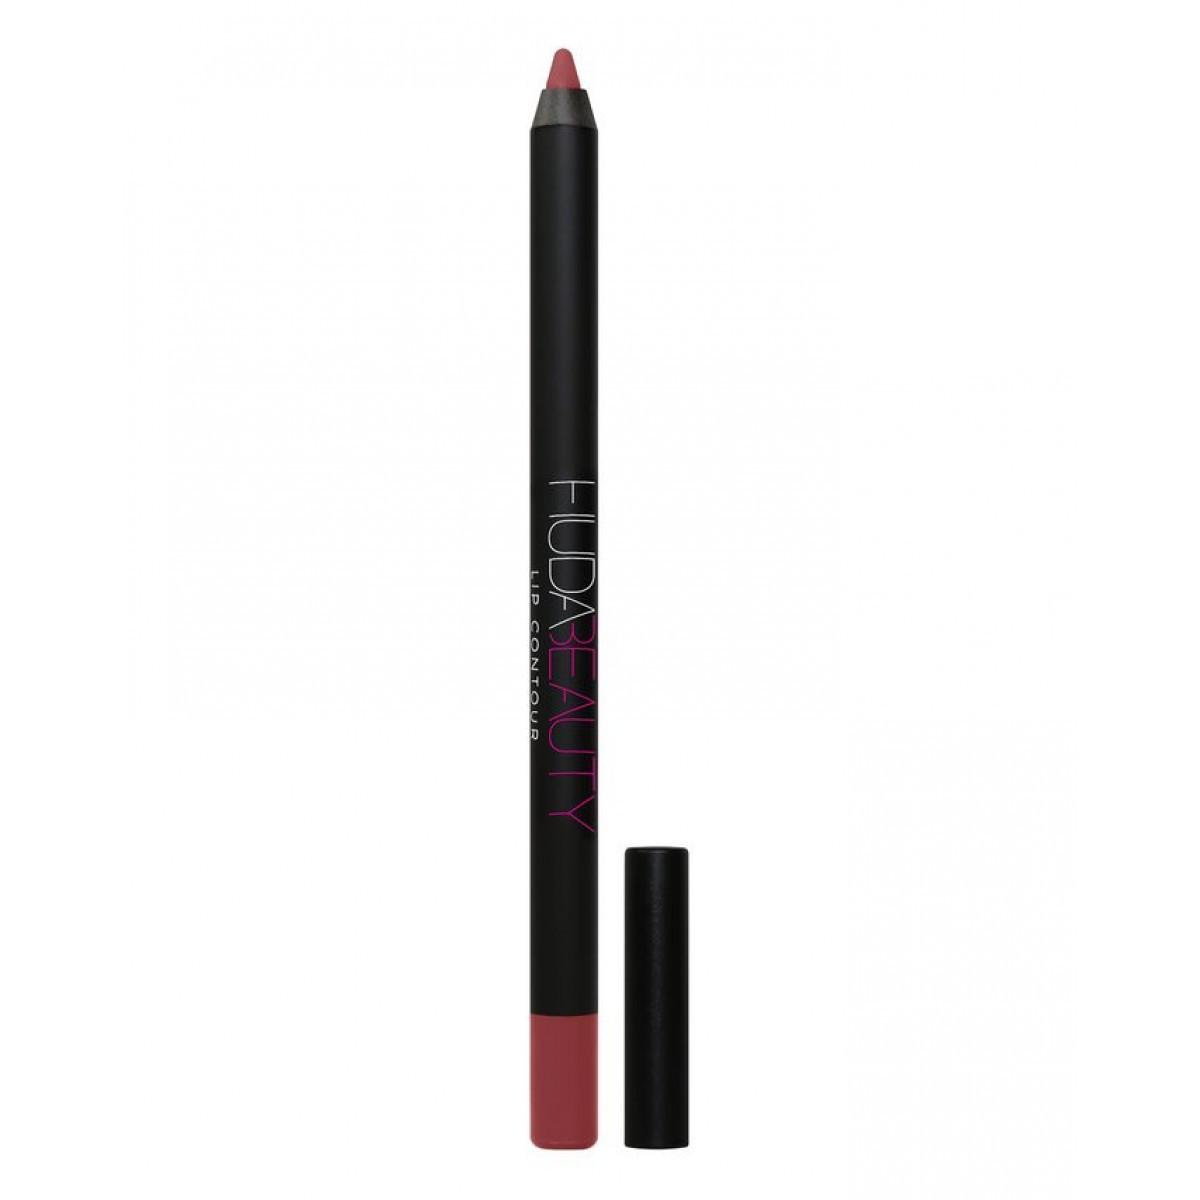 Карандаш для губ Huda Beauty Lip Contour Matte Pencil Тон - Cheerleader